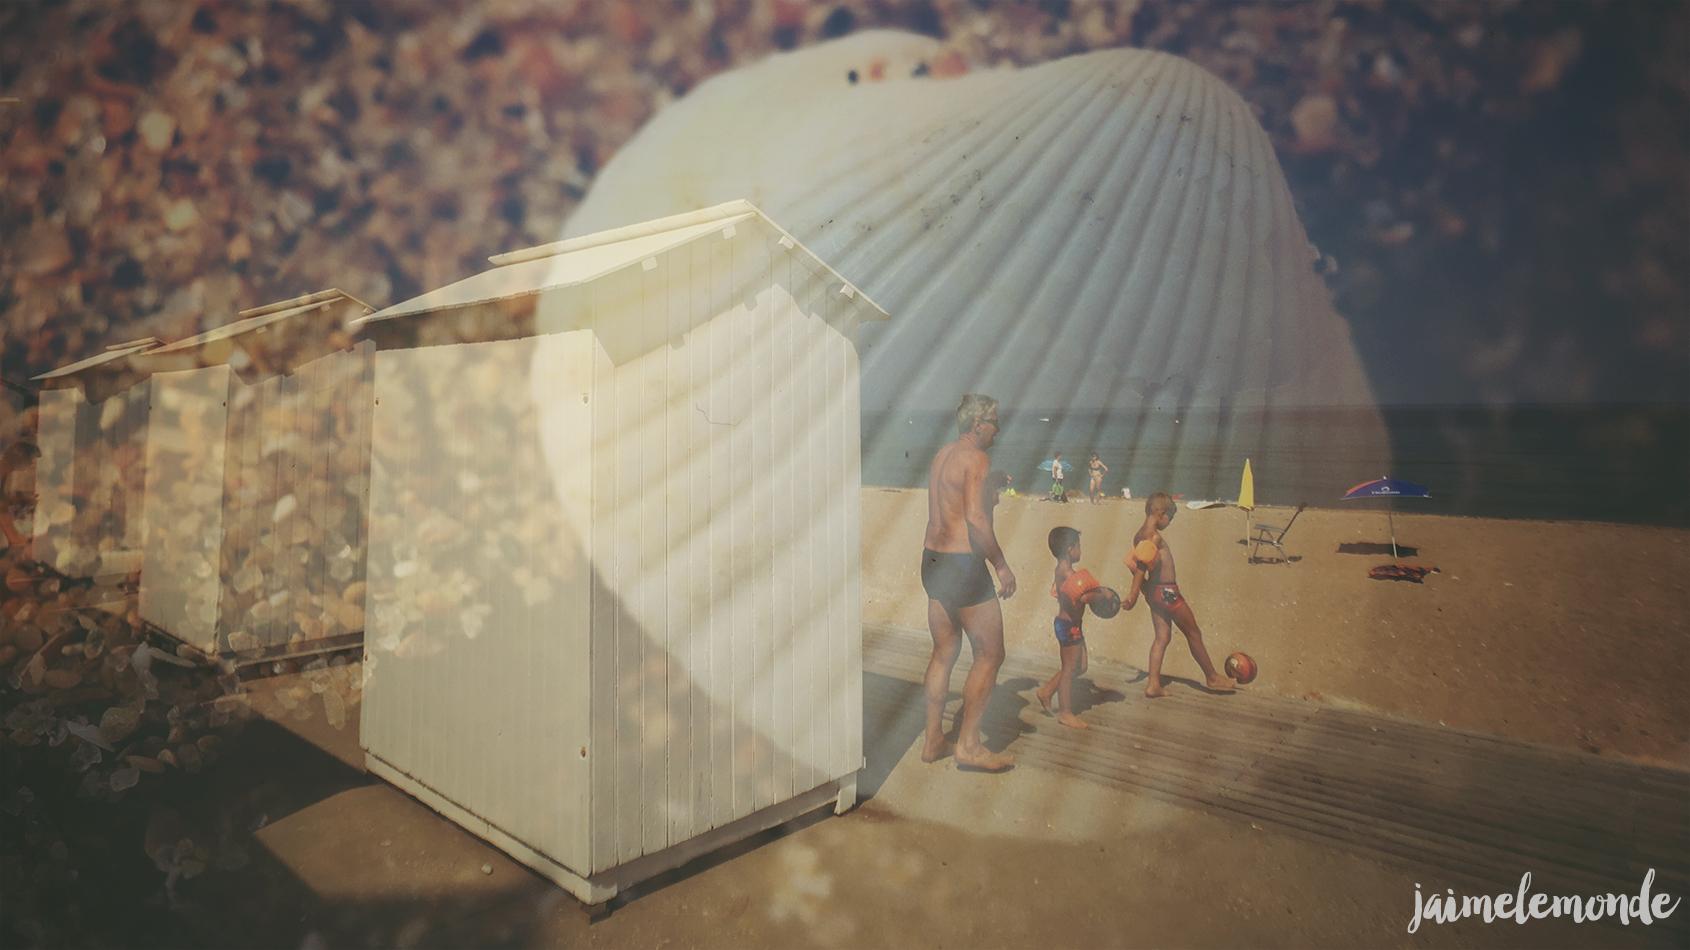 Pixter - Double exposition Snapseed - Blonville sur mer - ©jaimelemonde (4)